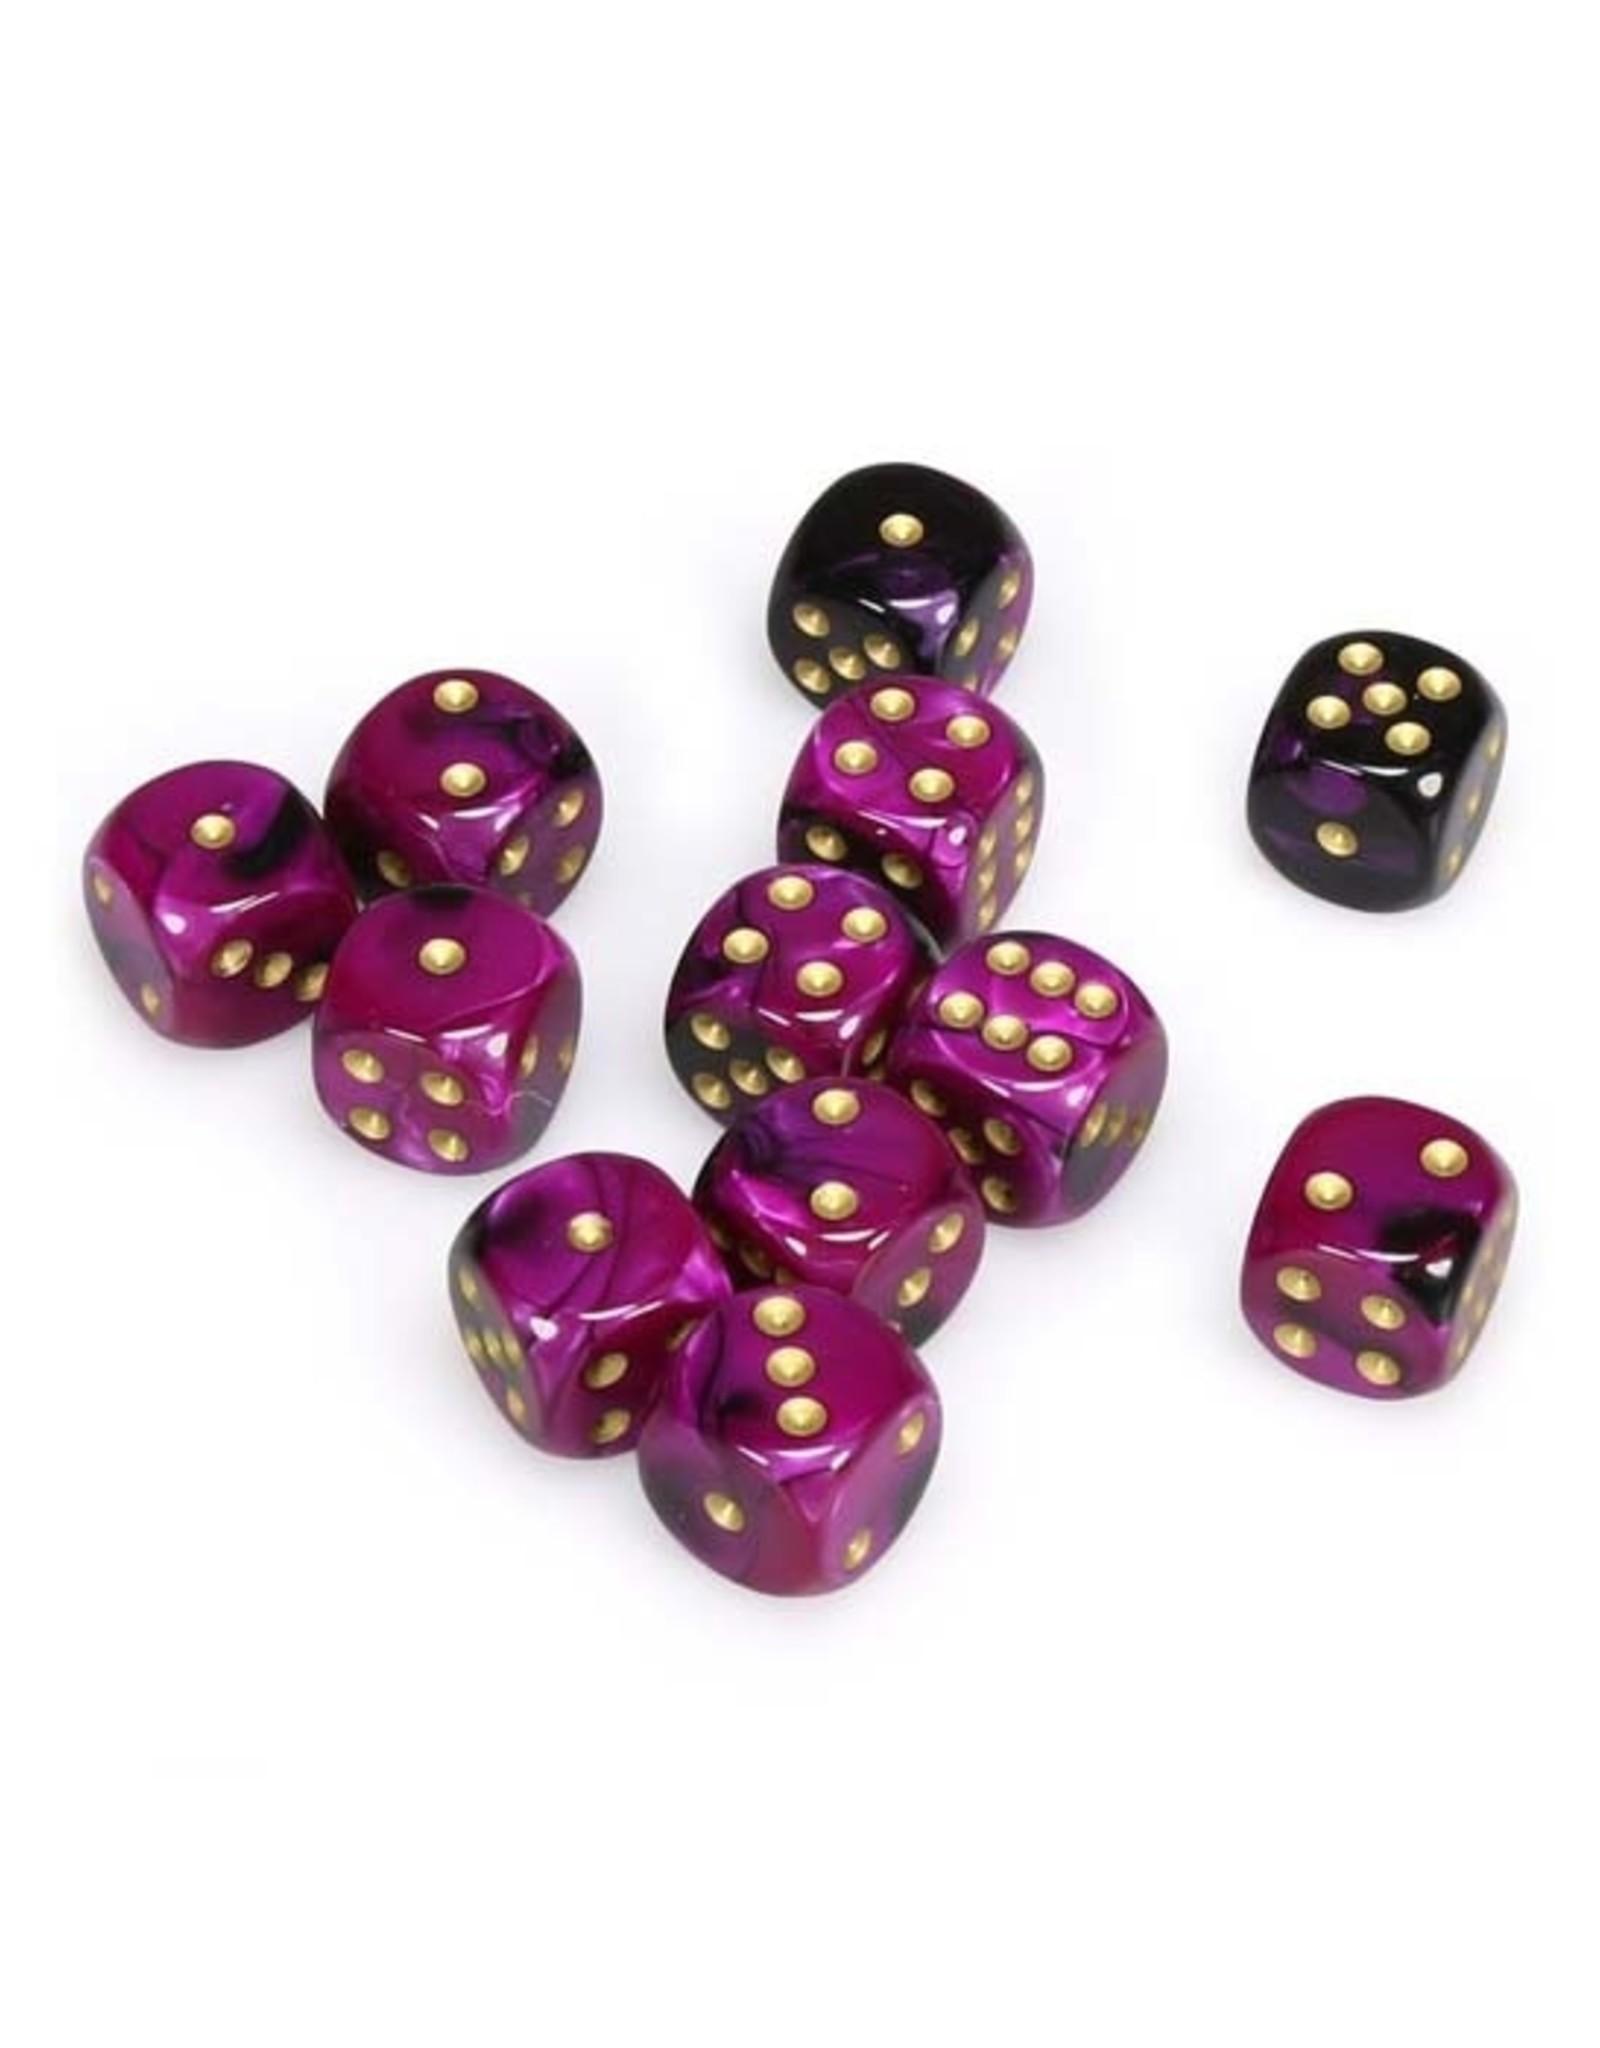 Chessex Chessex: 16mm D6 - Gemini - Black-Purple w/ Gold